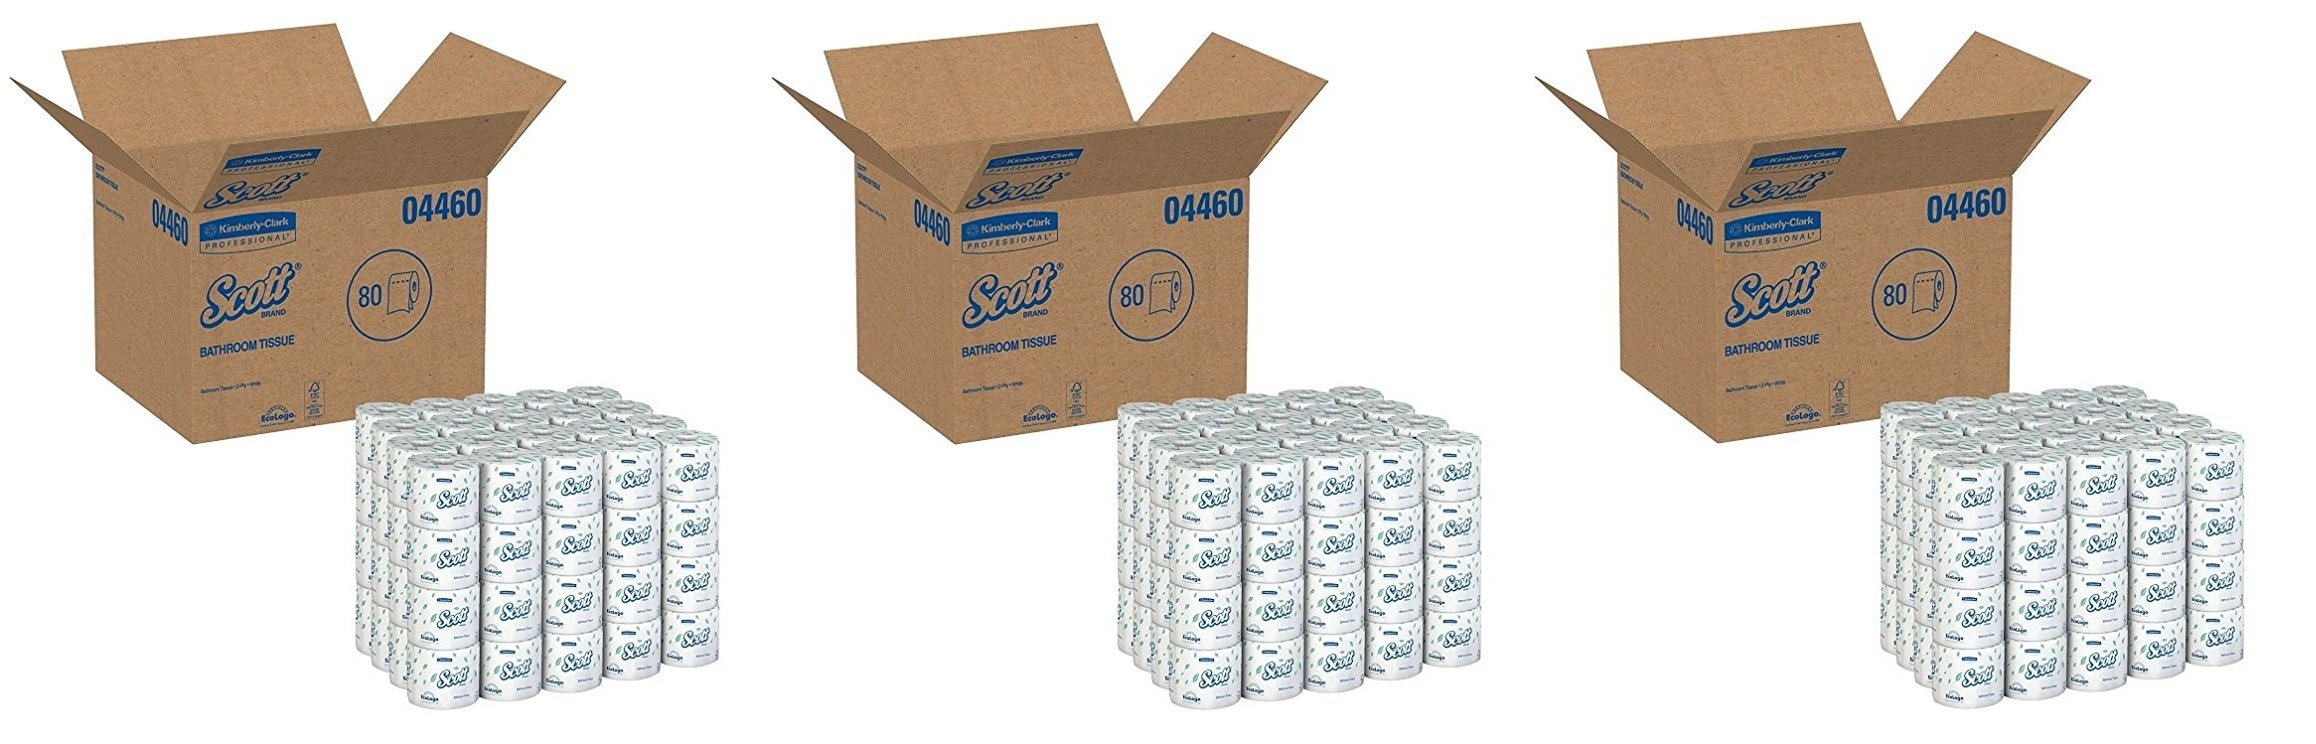 Kimberly-Clark Professional GID-881029 Scott 2-Ply Standard Roll Bathroom Tissue, White (Case of 80 Rolls) (3 CASES)